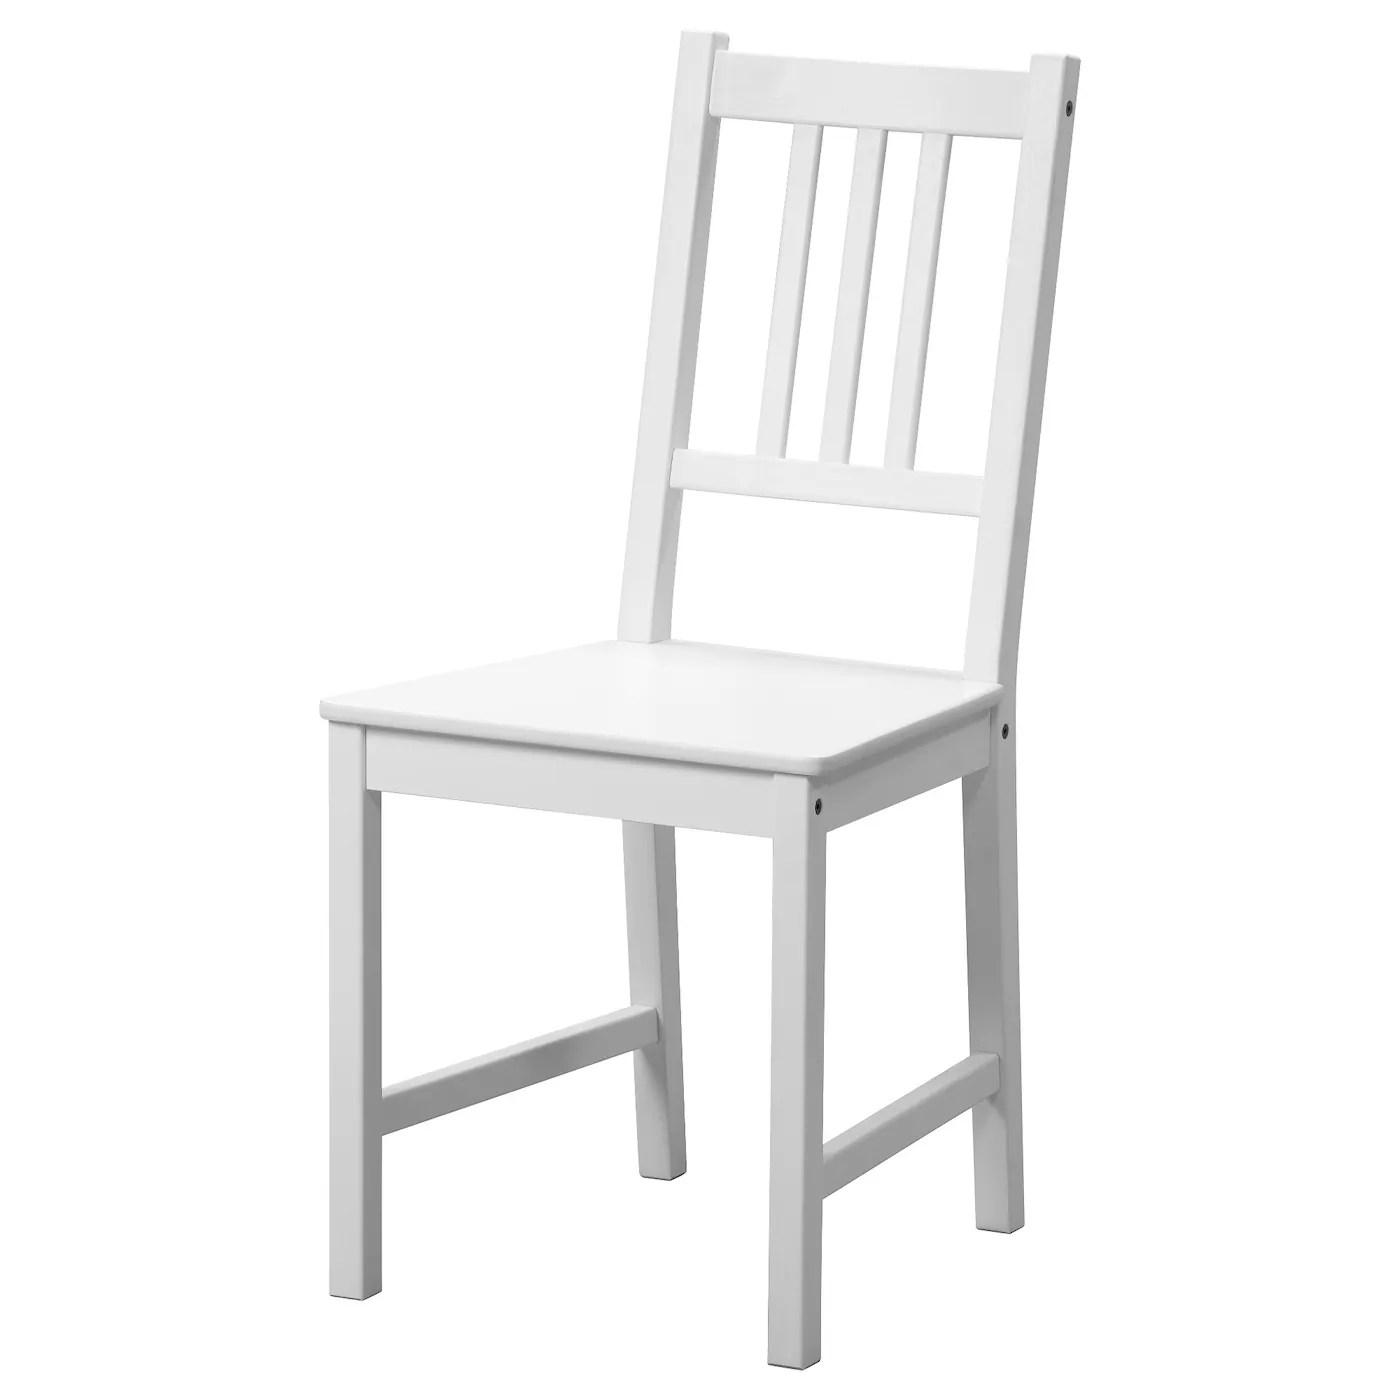 sedie sala da pranzo ikea. Sedie Sala Da Pranzo Ikea It